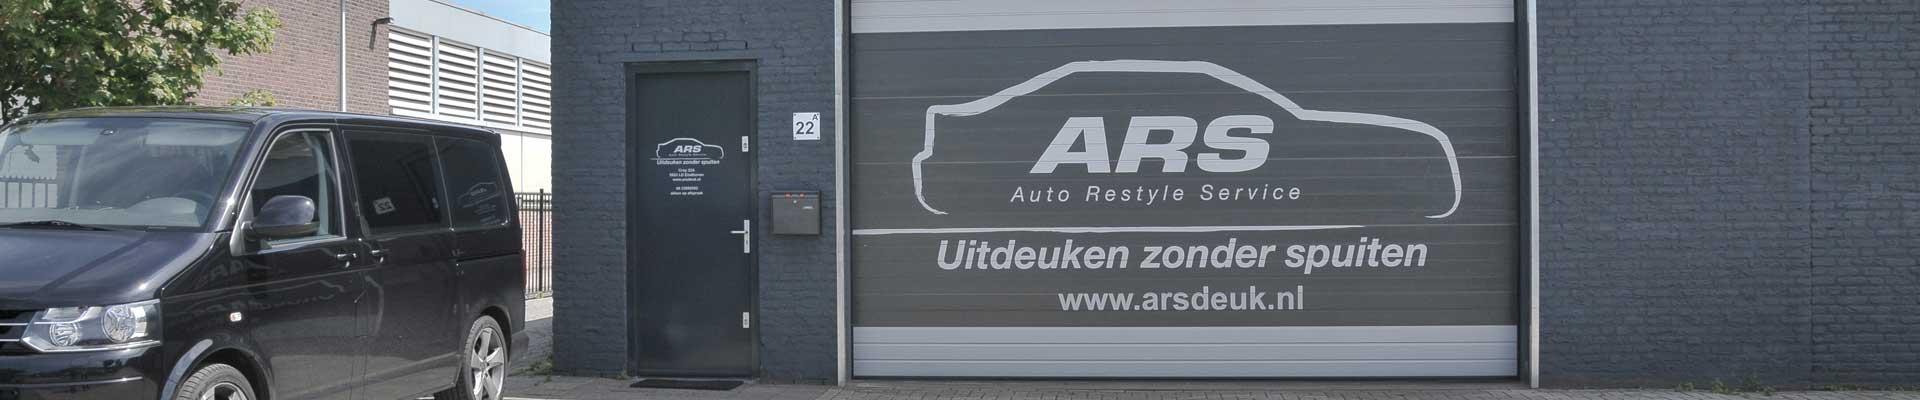 Auto Restyle Service